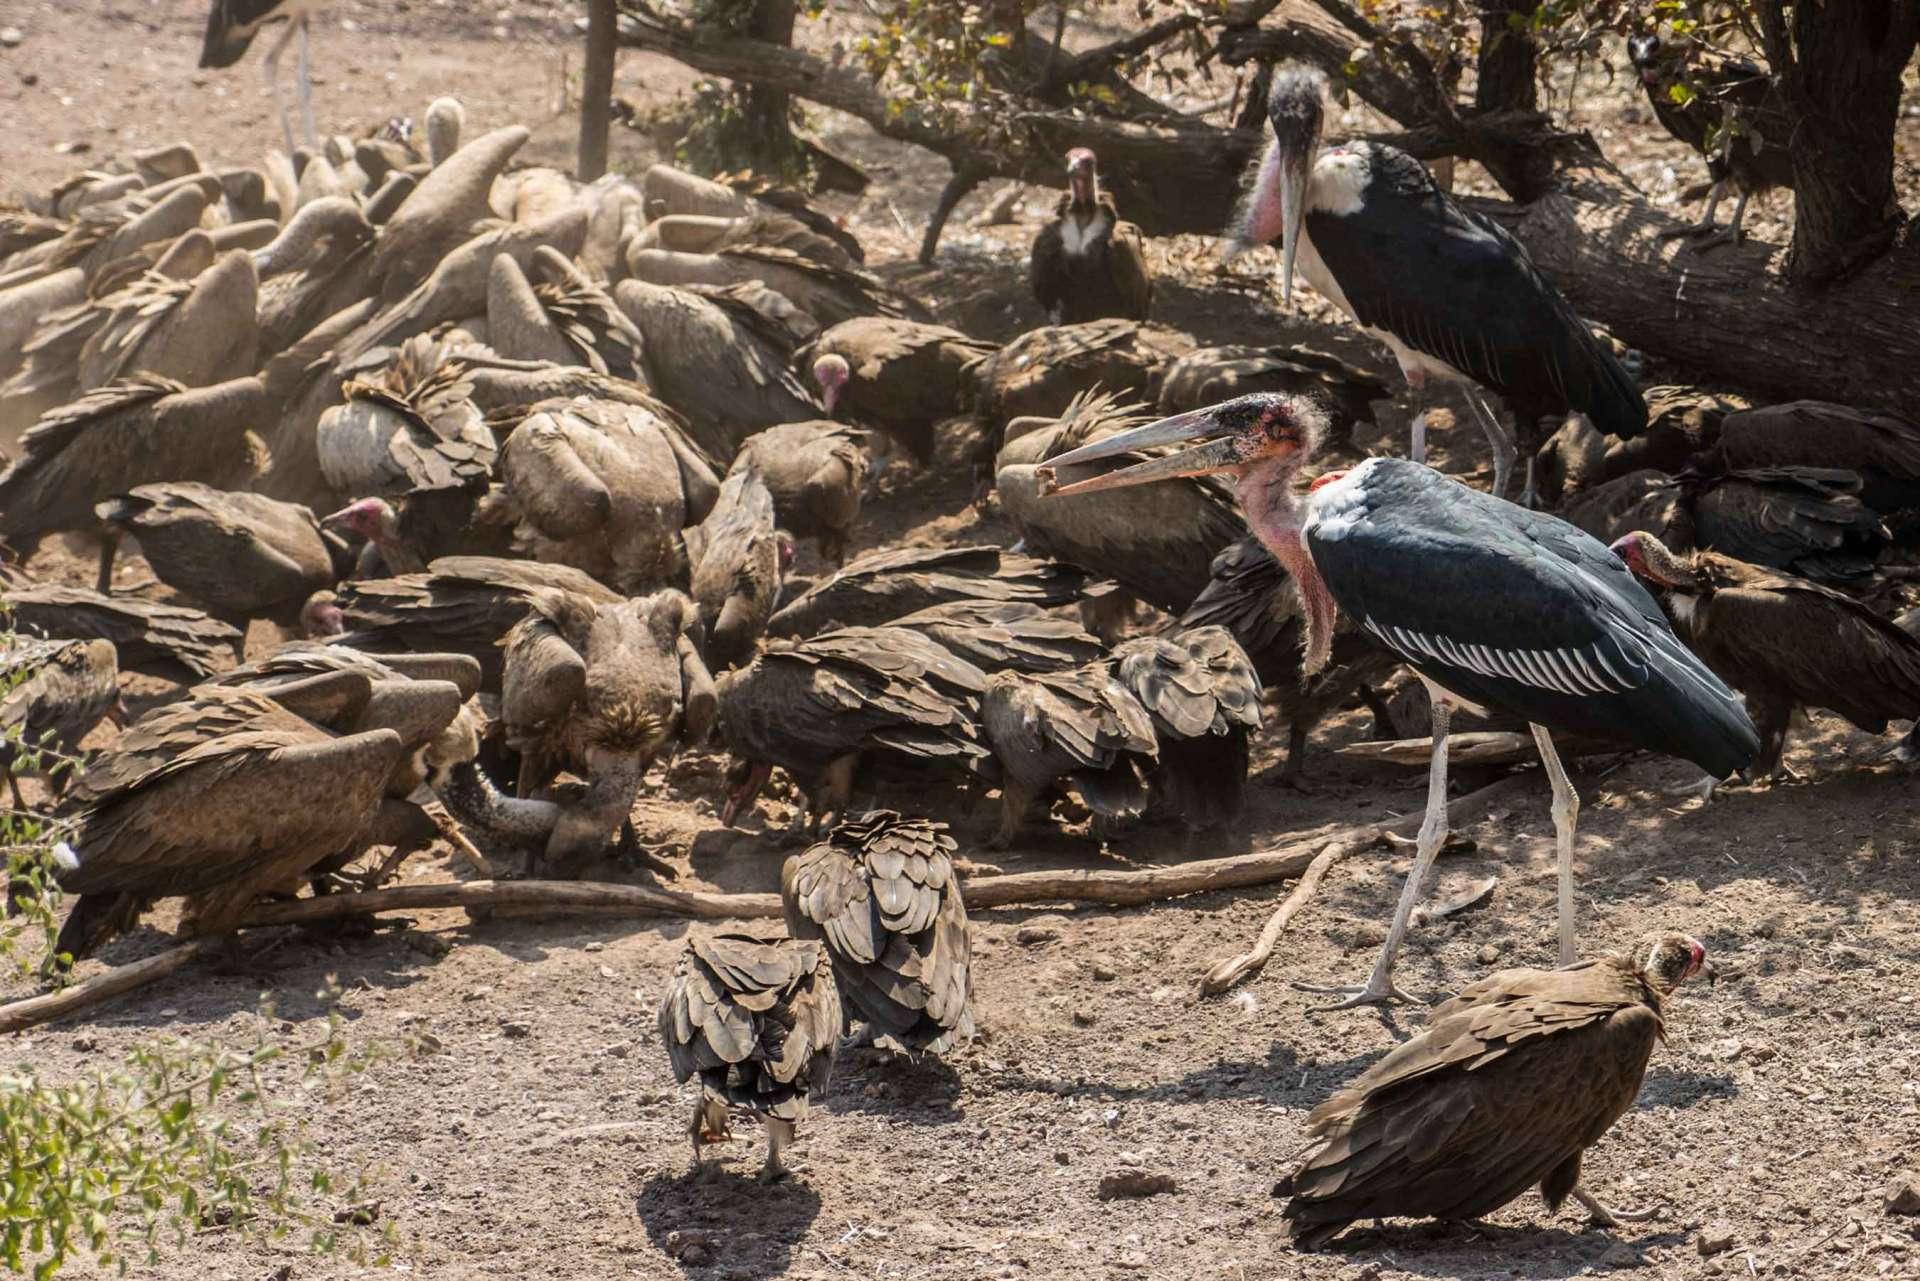 Victoria Falls Zimbawe Enrico Pescantini Victoria Falls Safari Lodge vultures